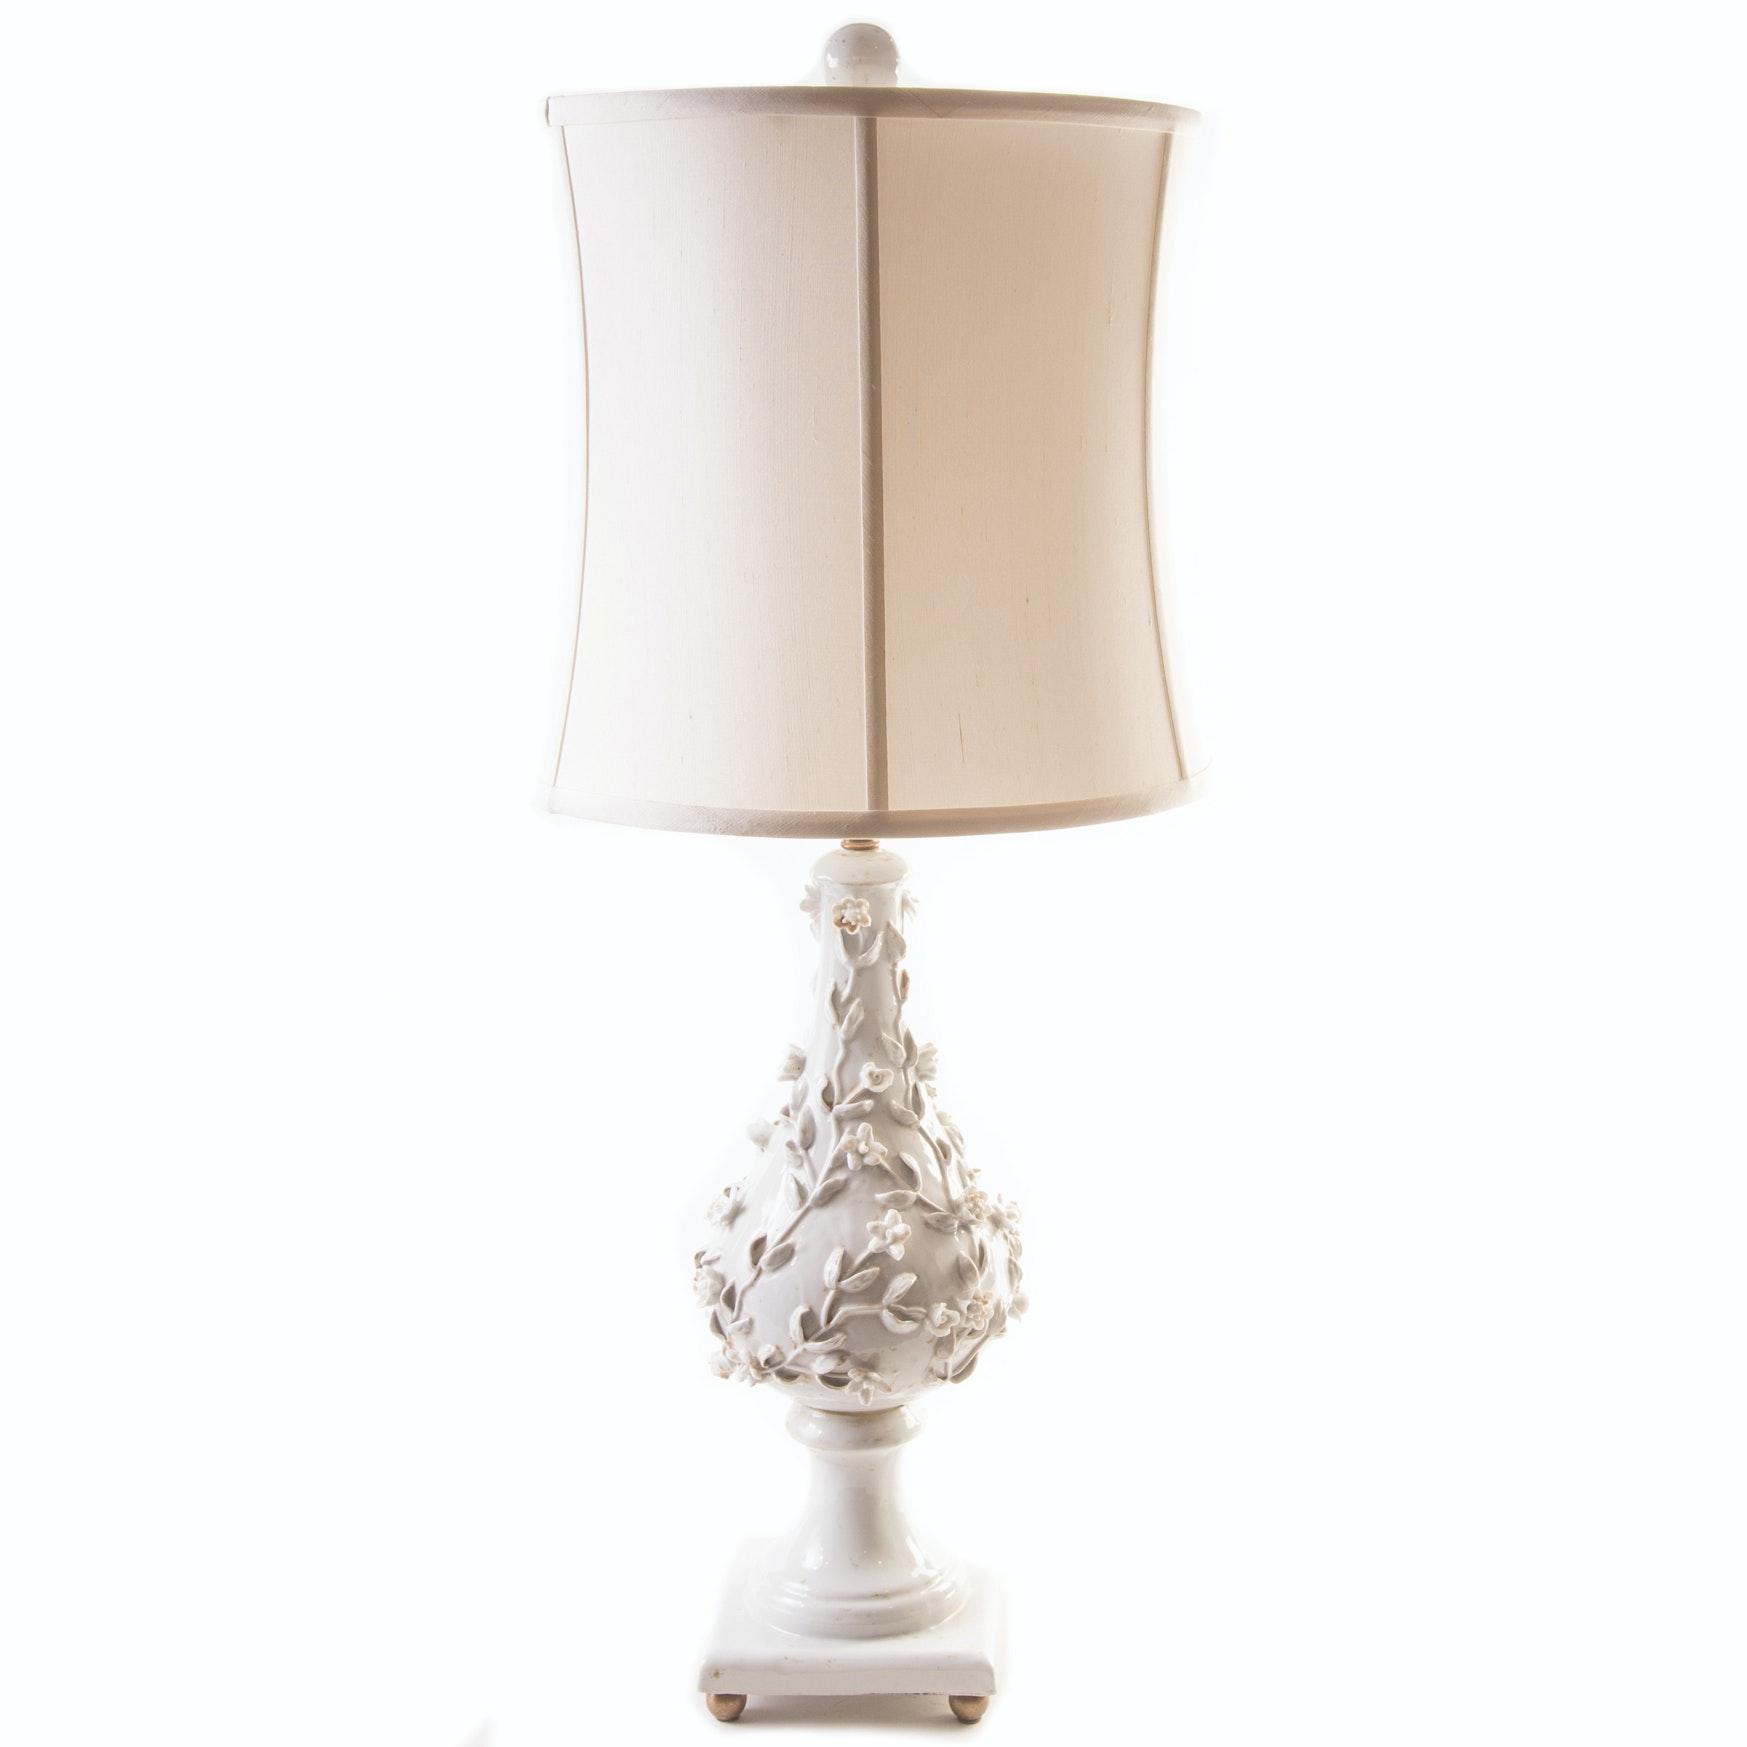 Vintage Porcelain Table Lamp